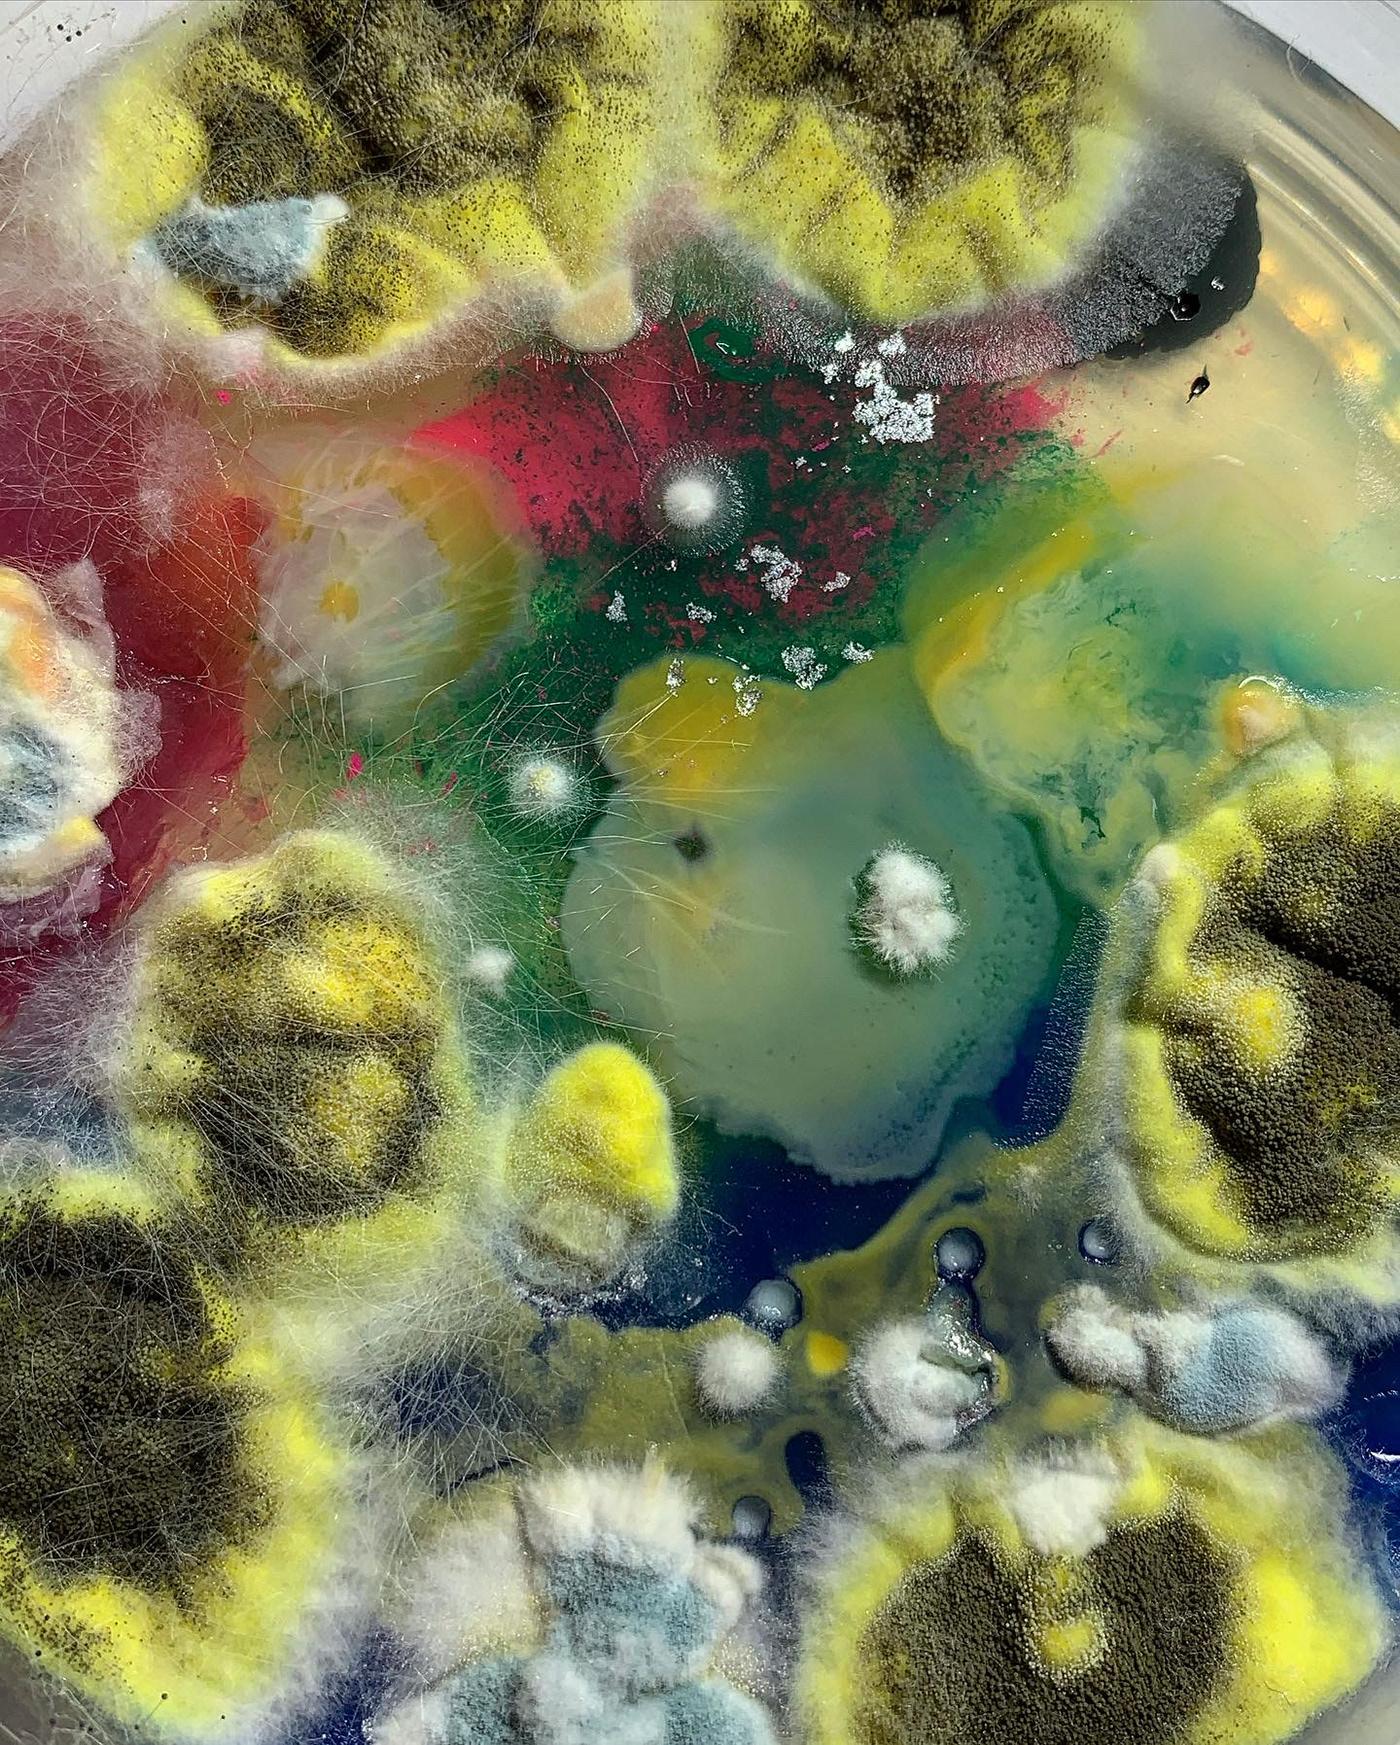 art background bio bioart colour design FINEART Fungi Greens human inspiration la mix molds Nature pattern Photography  science spores textured